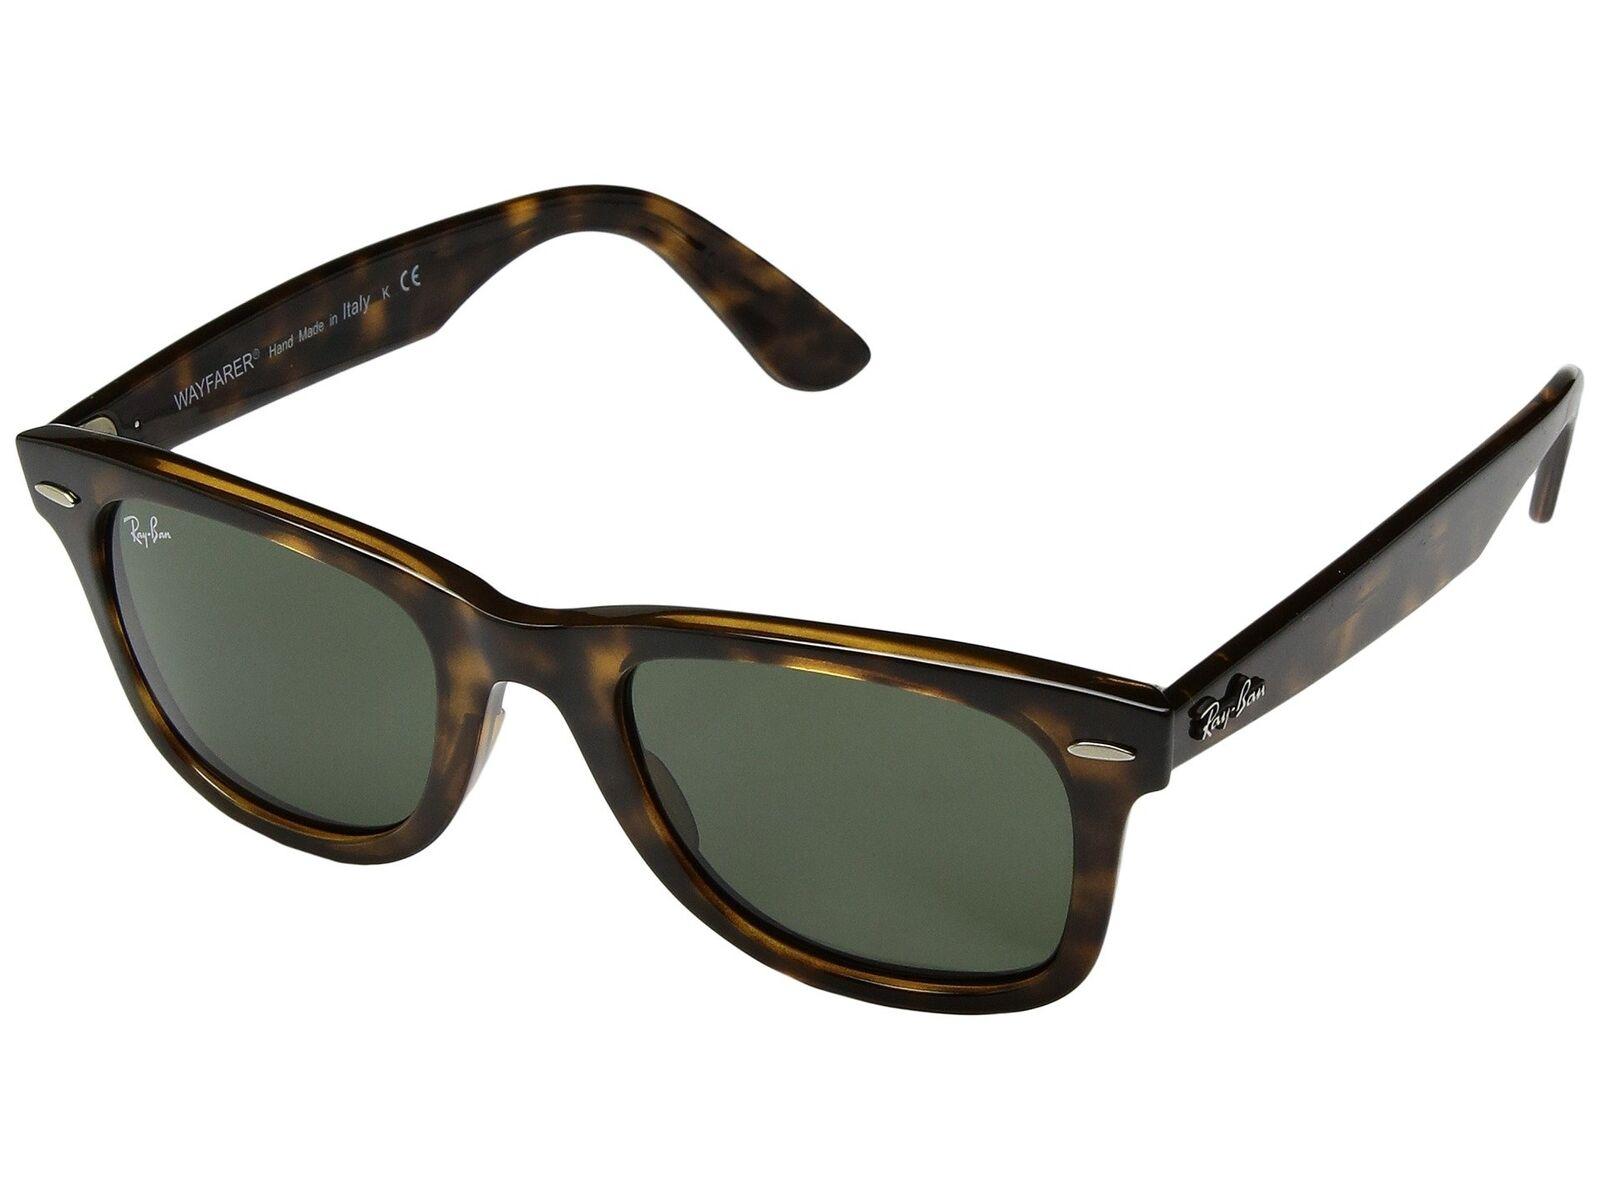 6fcc0786fd Ray Ban Wayfarer RB4340 710 50MM Tortoise   Green 50mm Sunglasses